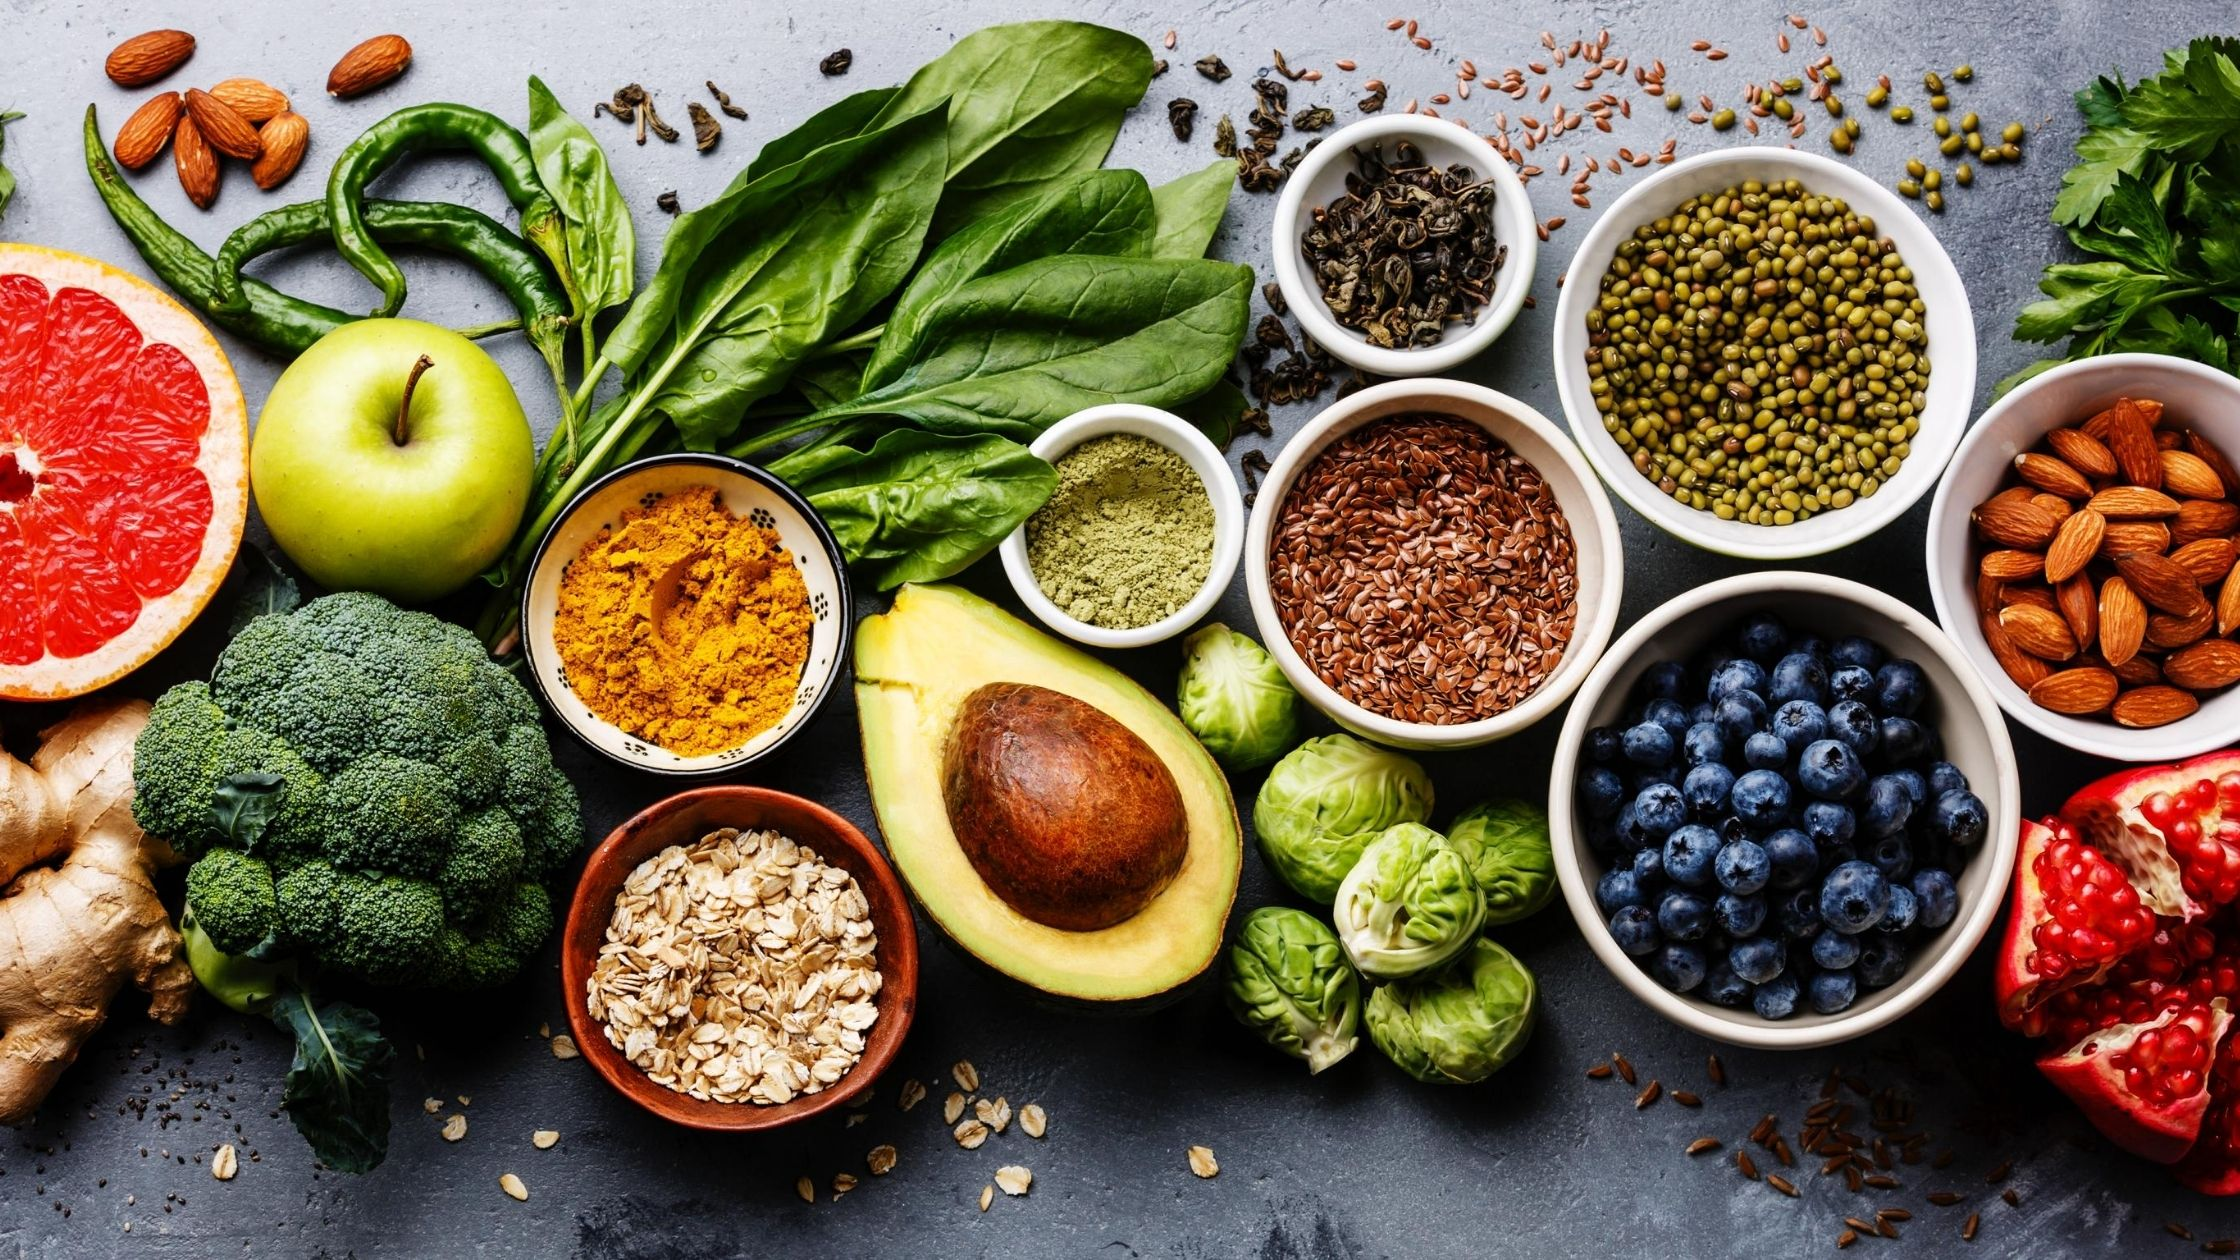 táplálék magas vérnyomás esetén 2)